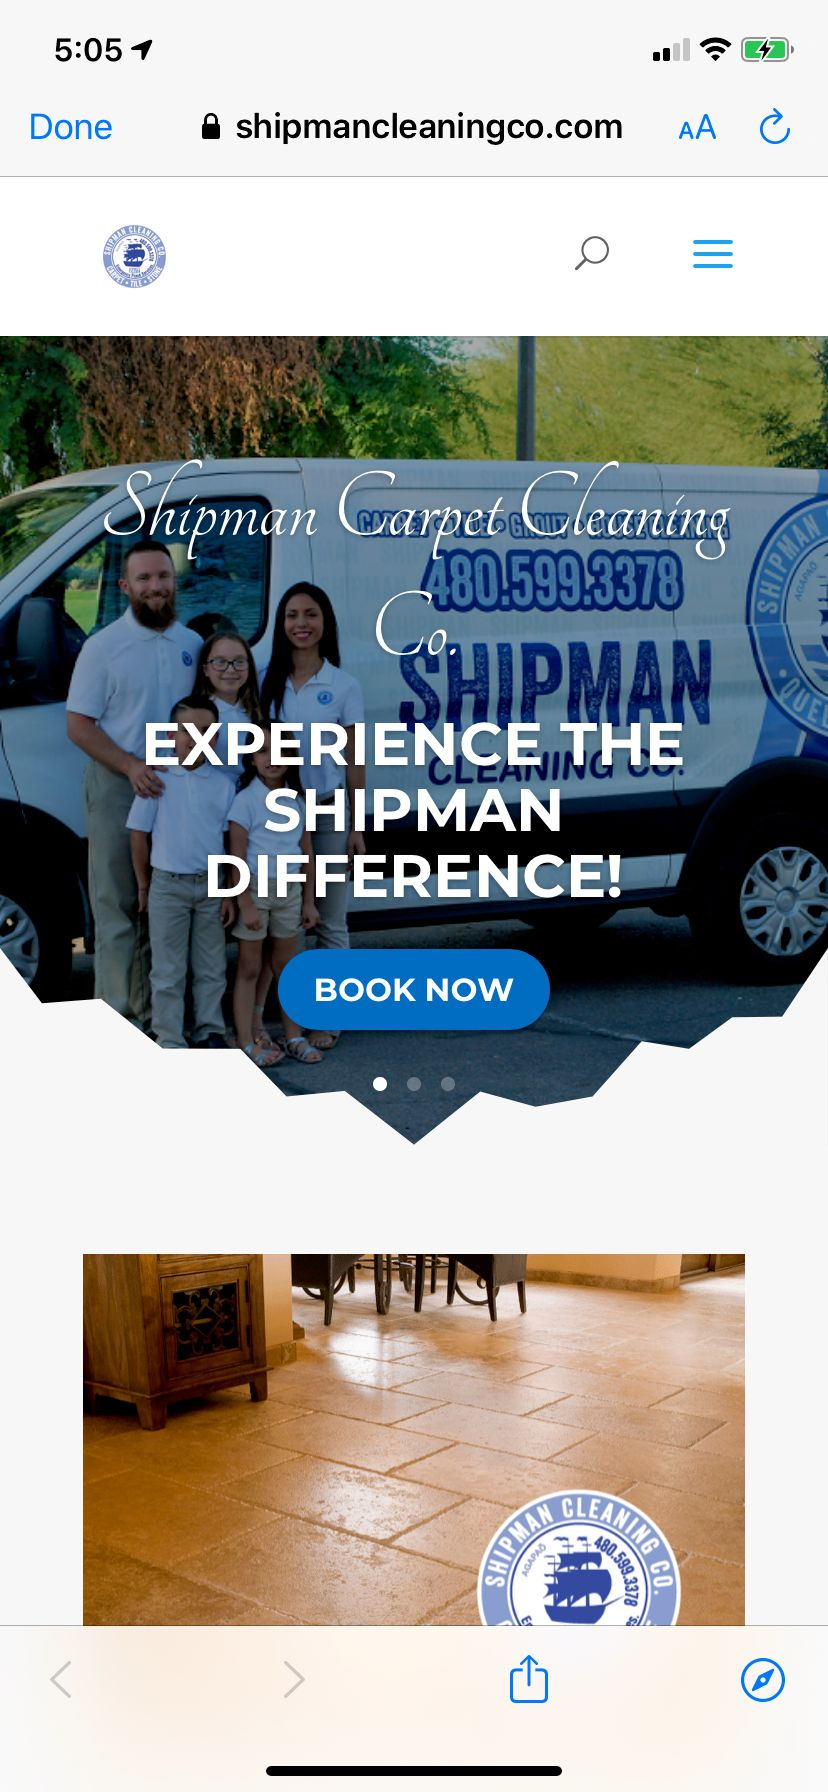 Shipman Cleaning Co Web Design